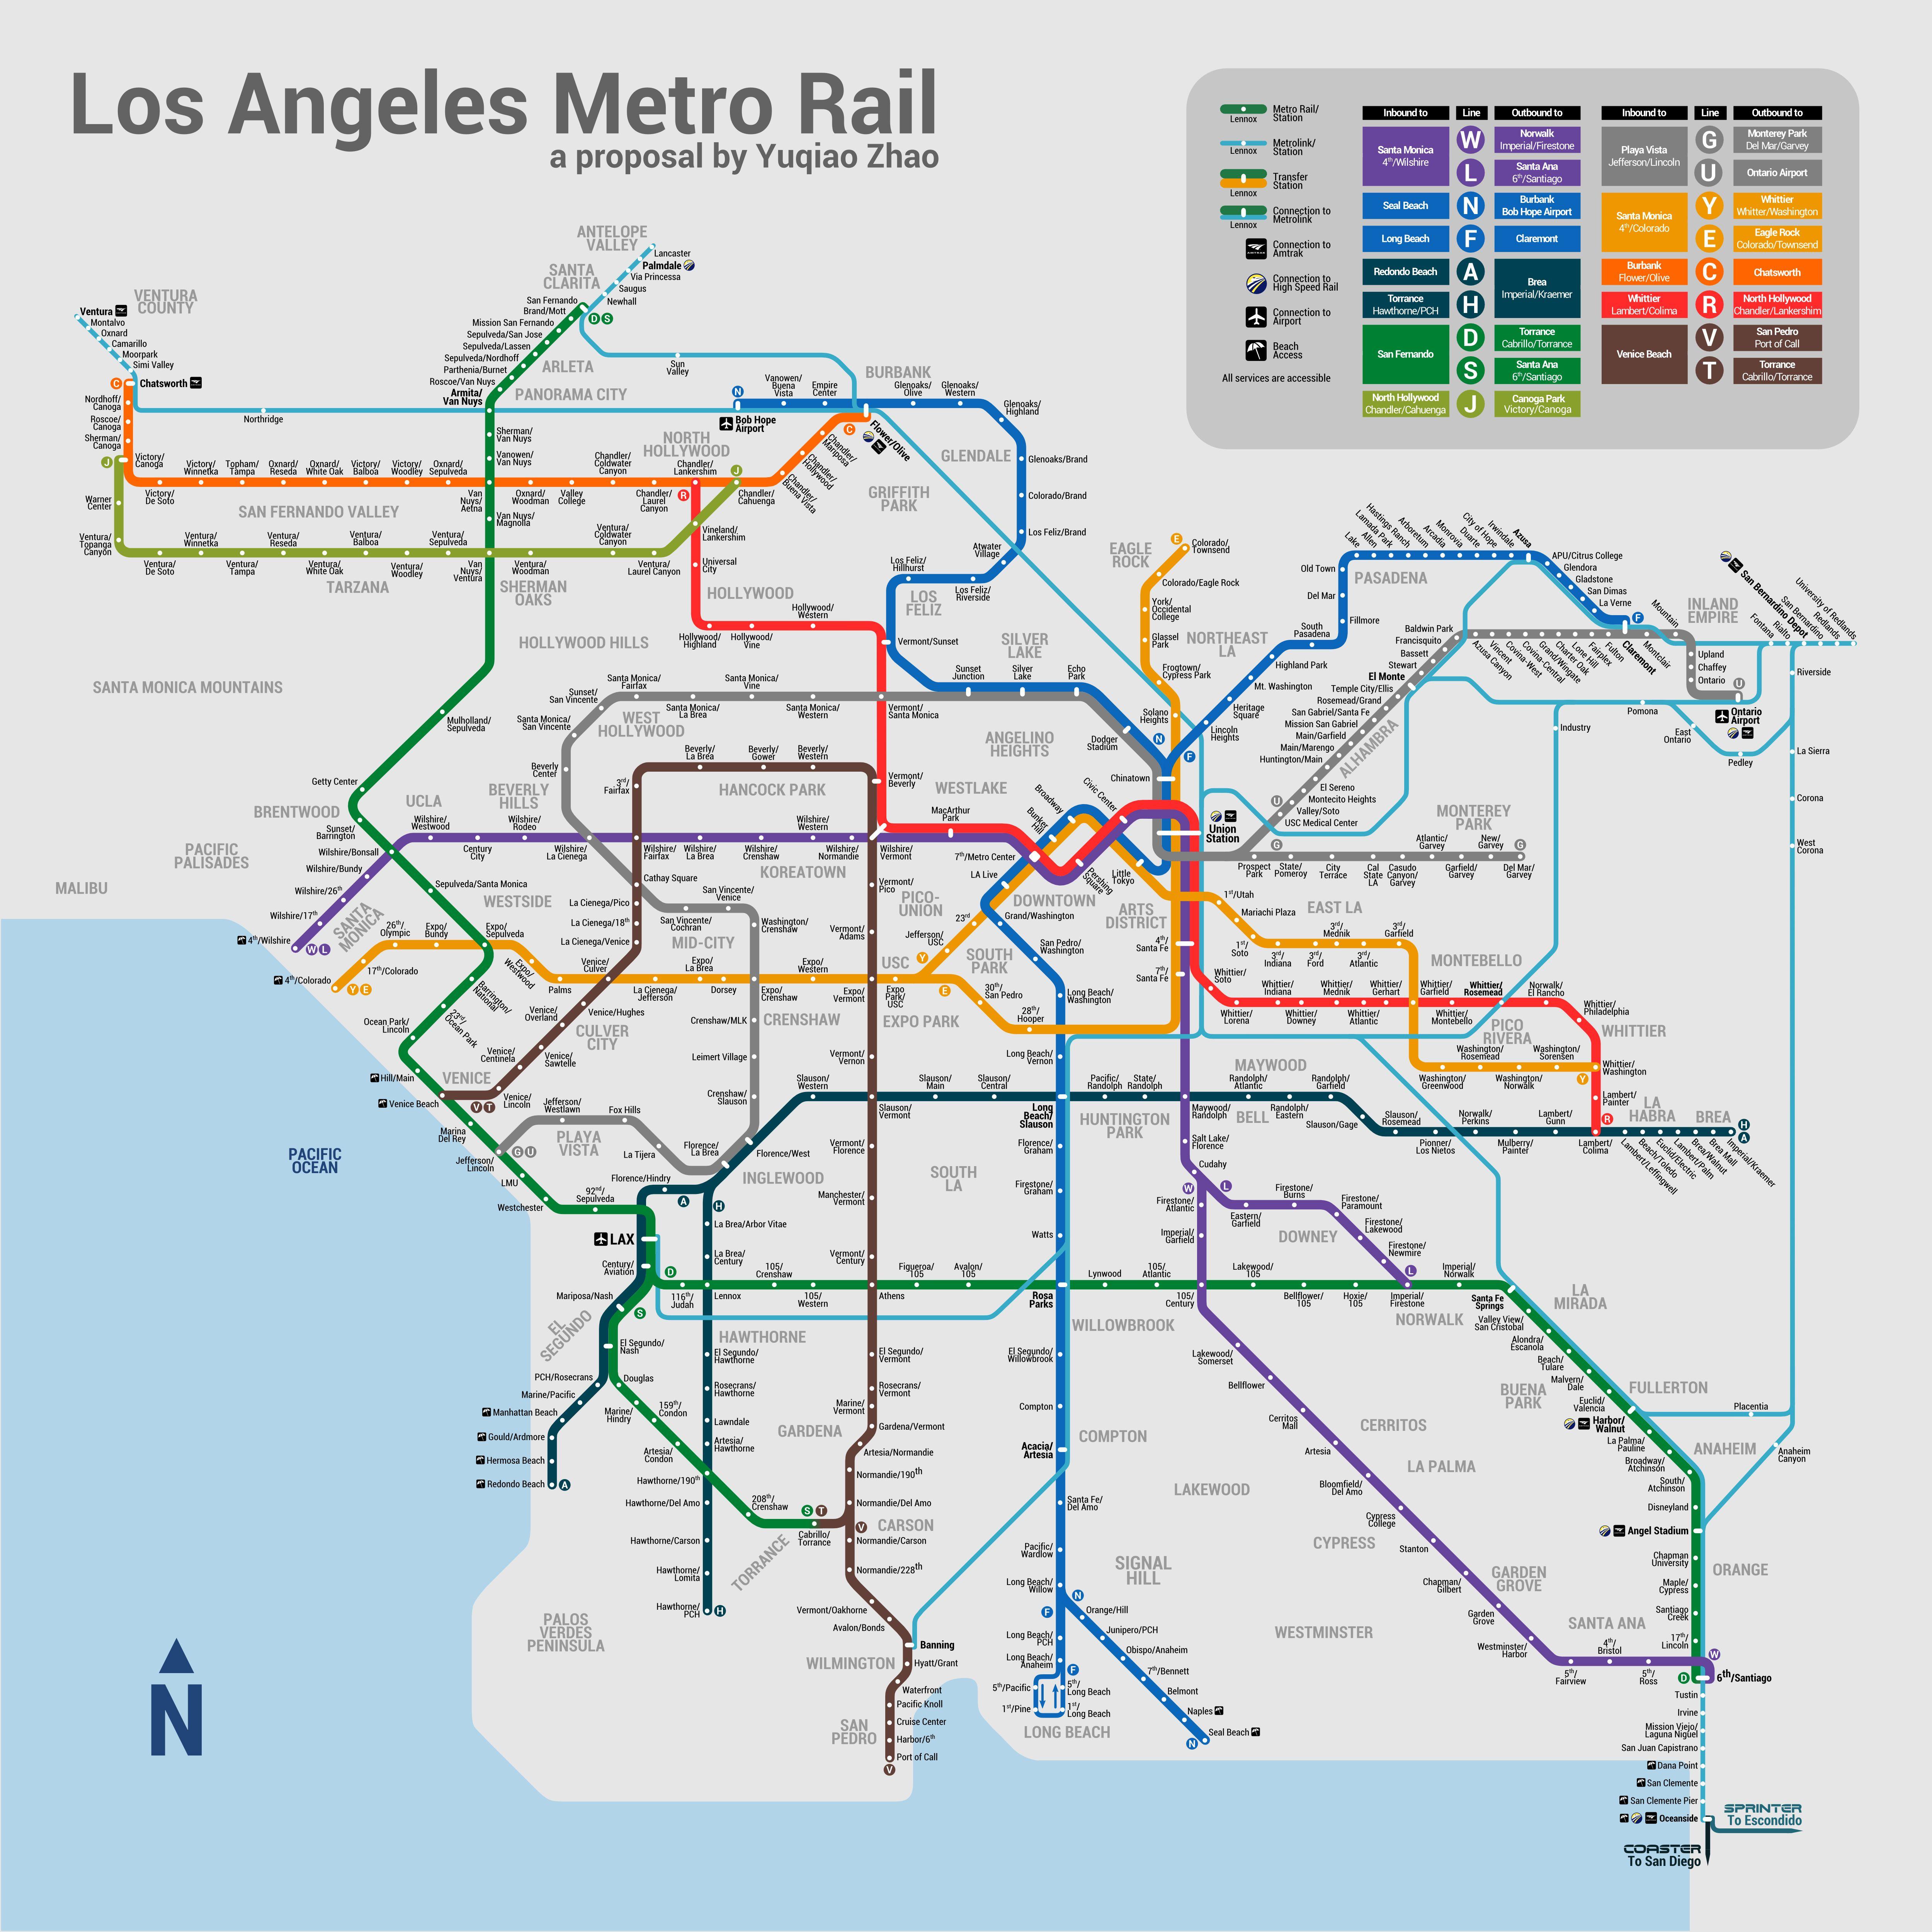 Los Angeles Metro Fantasy Map Best Metro Rail And Los Angeles Ideas - Los angeles metro expansion map